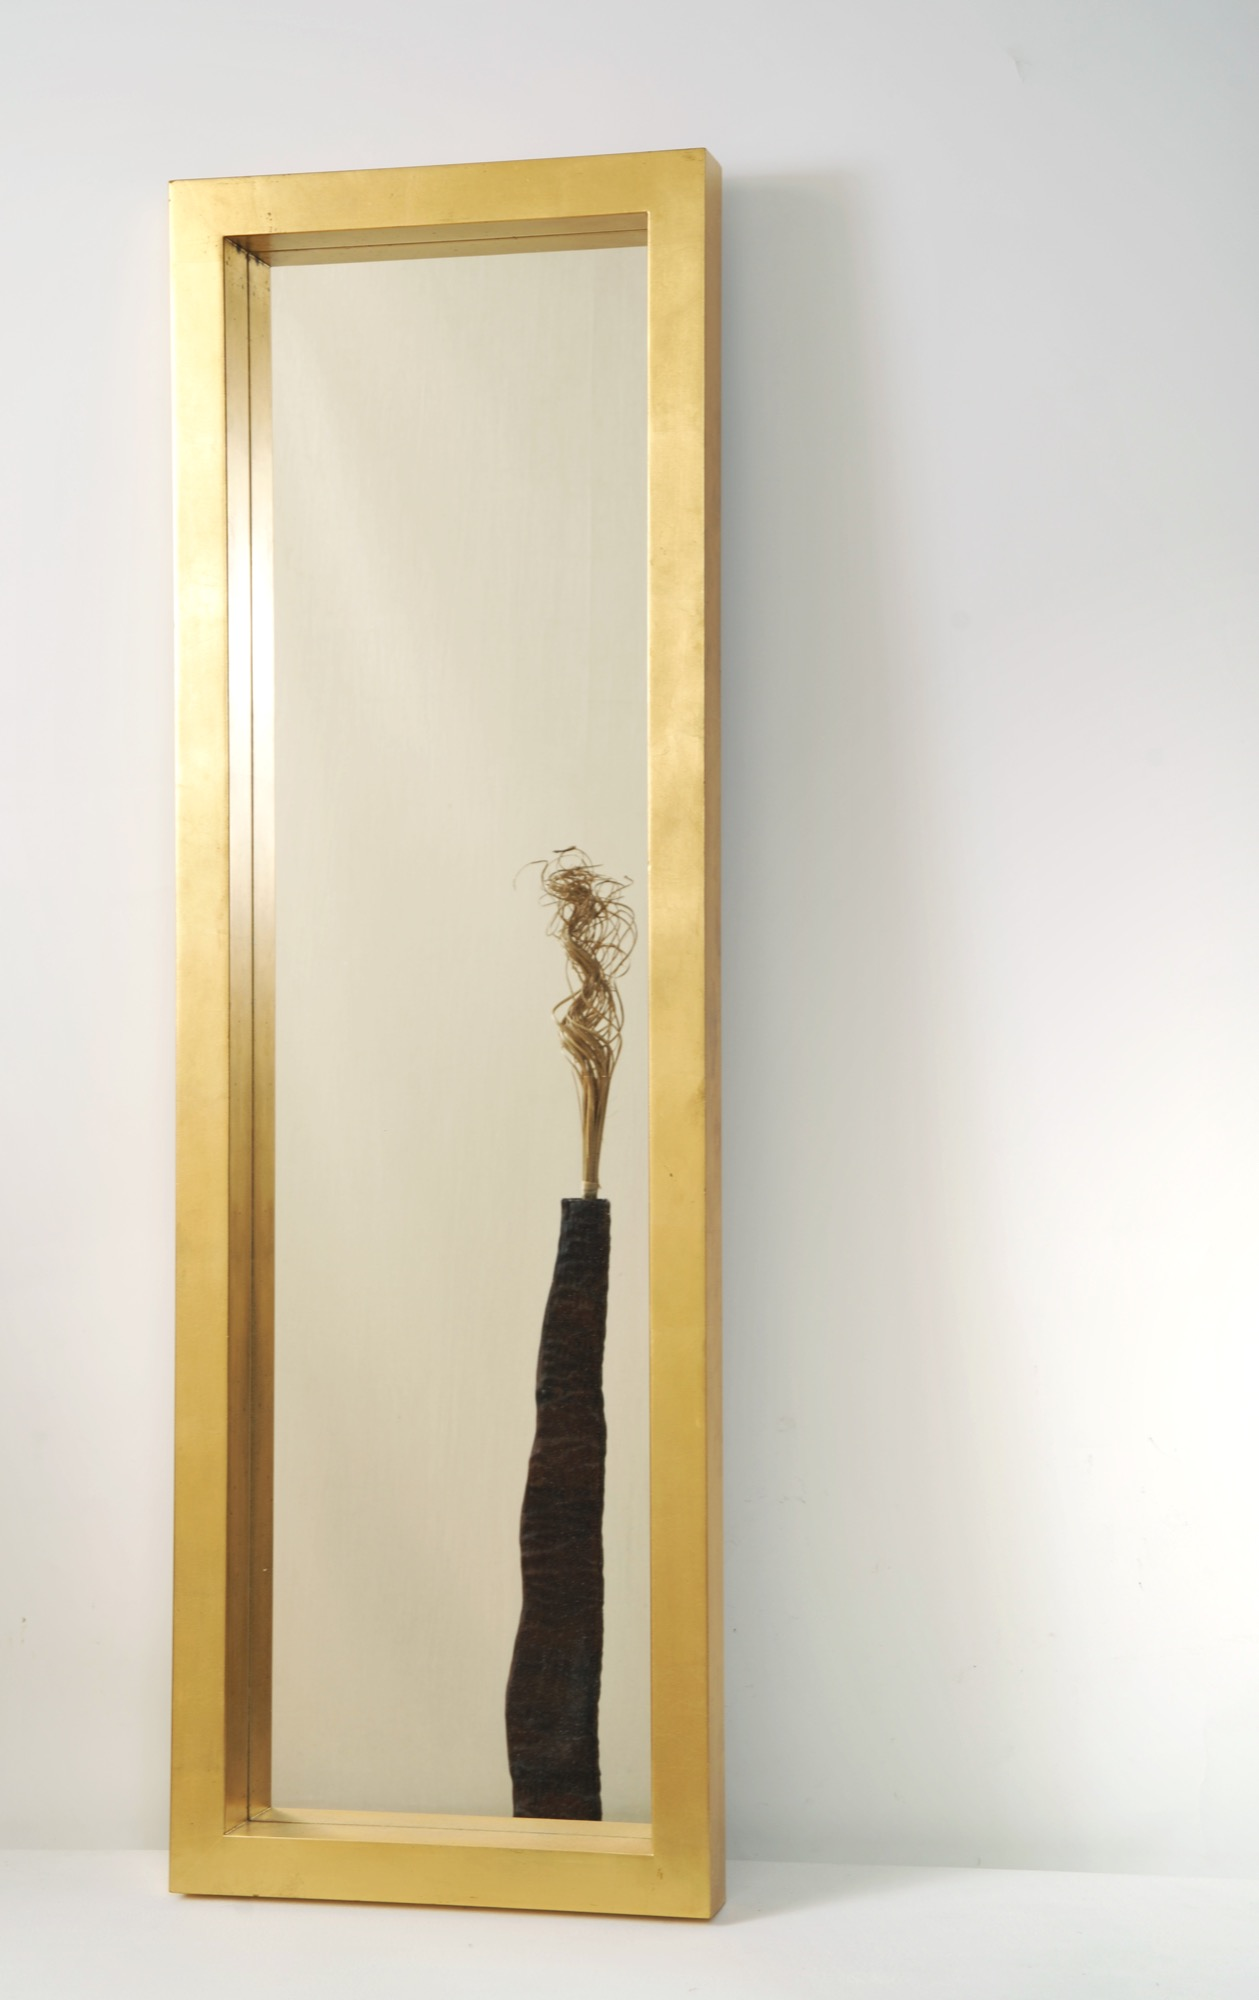 Spiegel CLASSICO AMERIKA GRANDE, Rahmen Holz MDF blattvergoldet Haus ...